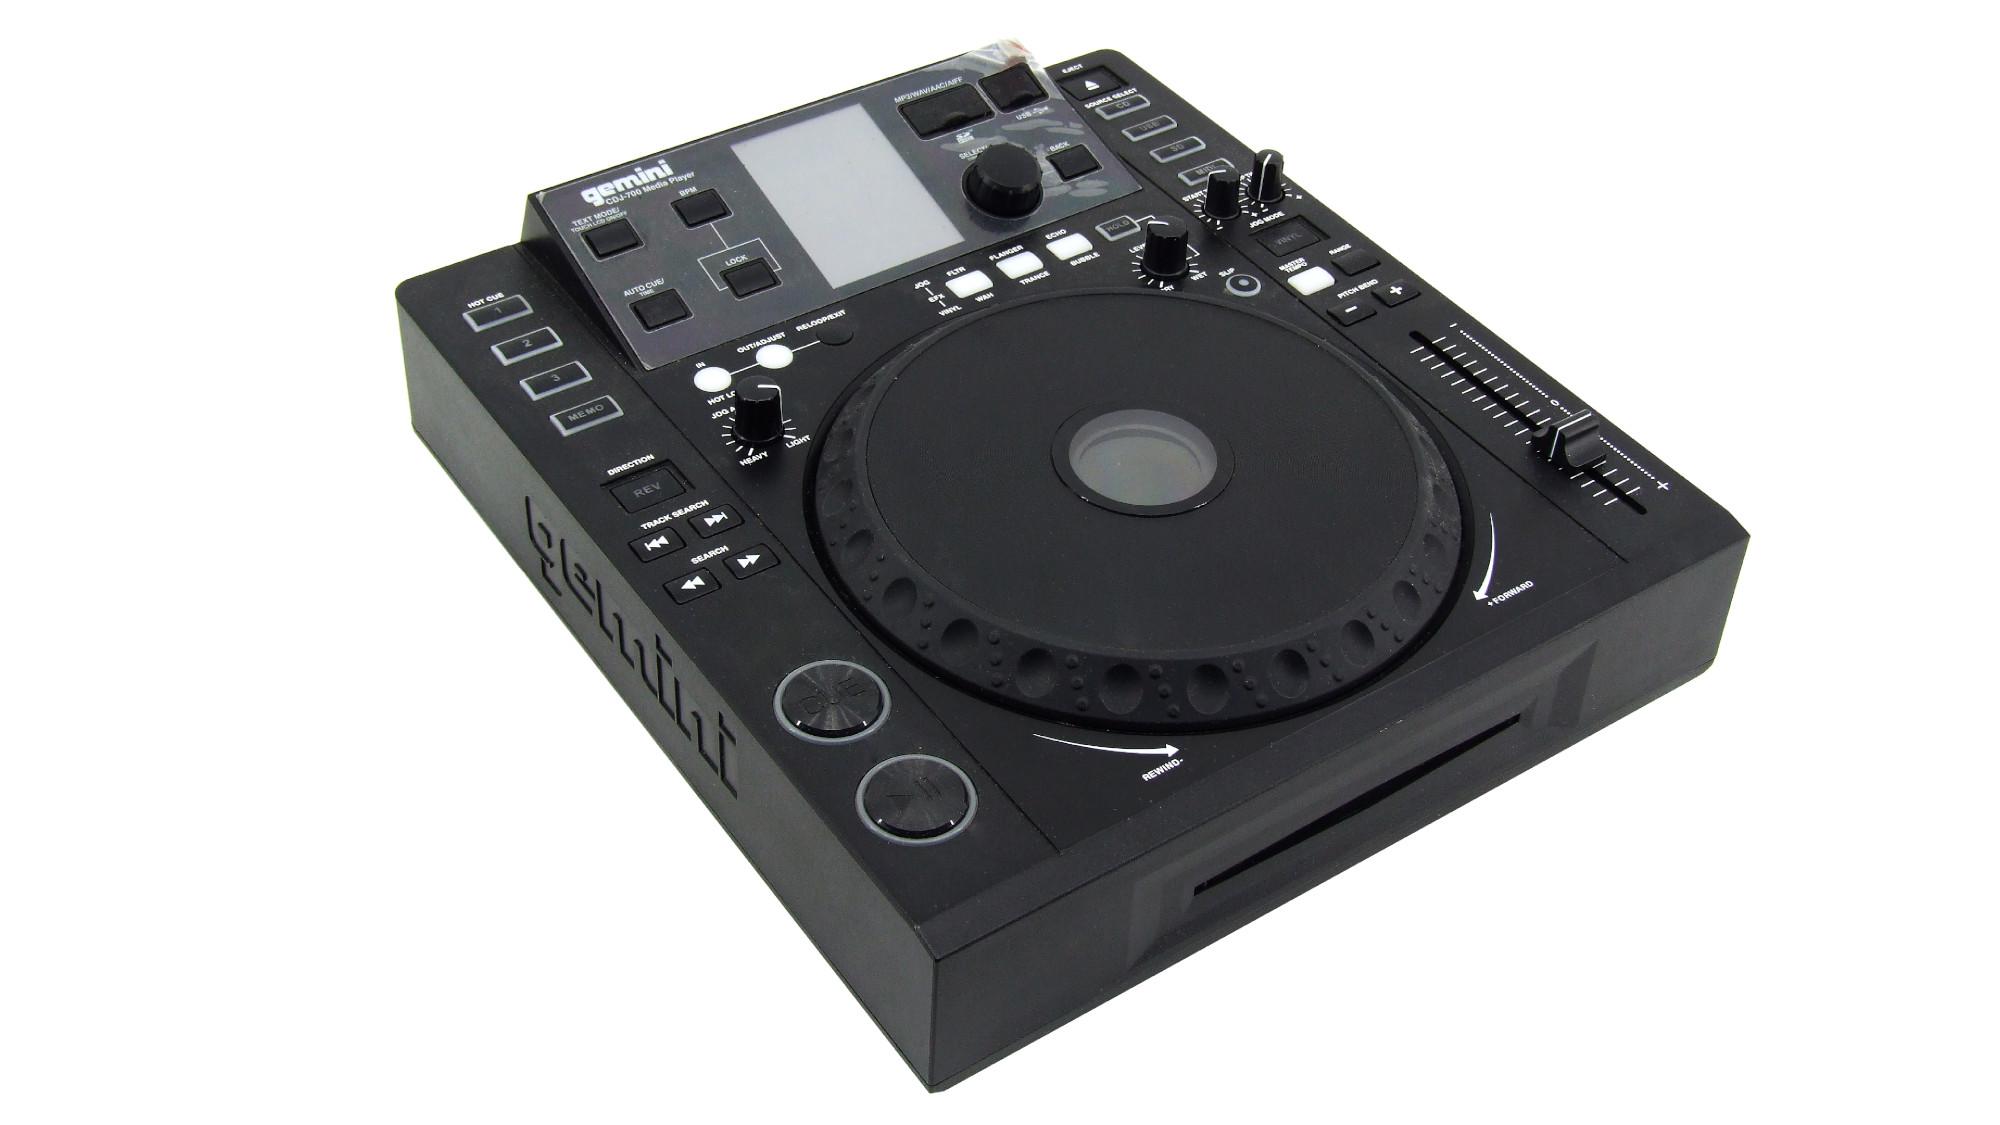 CDJ-700 Media-Player leihen